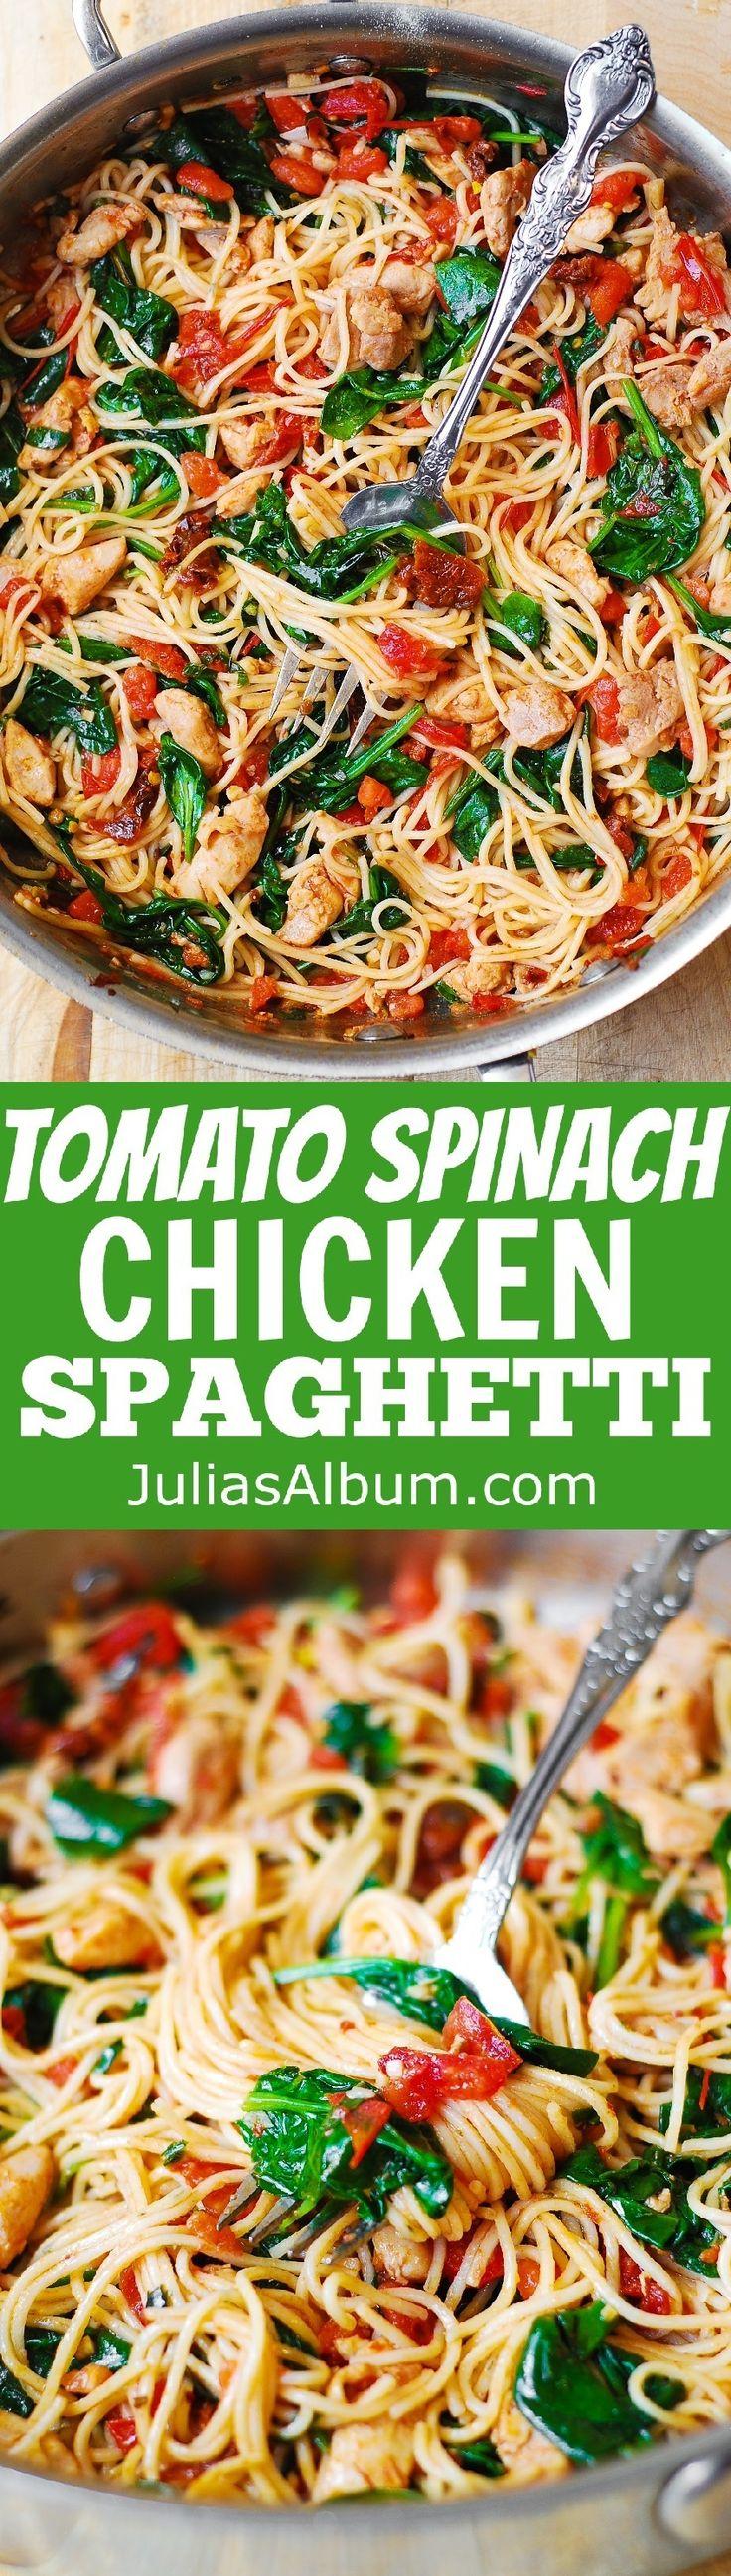 Tomato Basil & Spinach Chicken Spaghetti – healthy, Mediterranean style dinner!